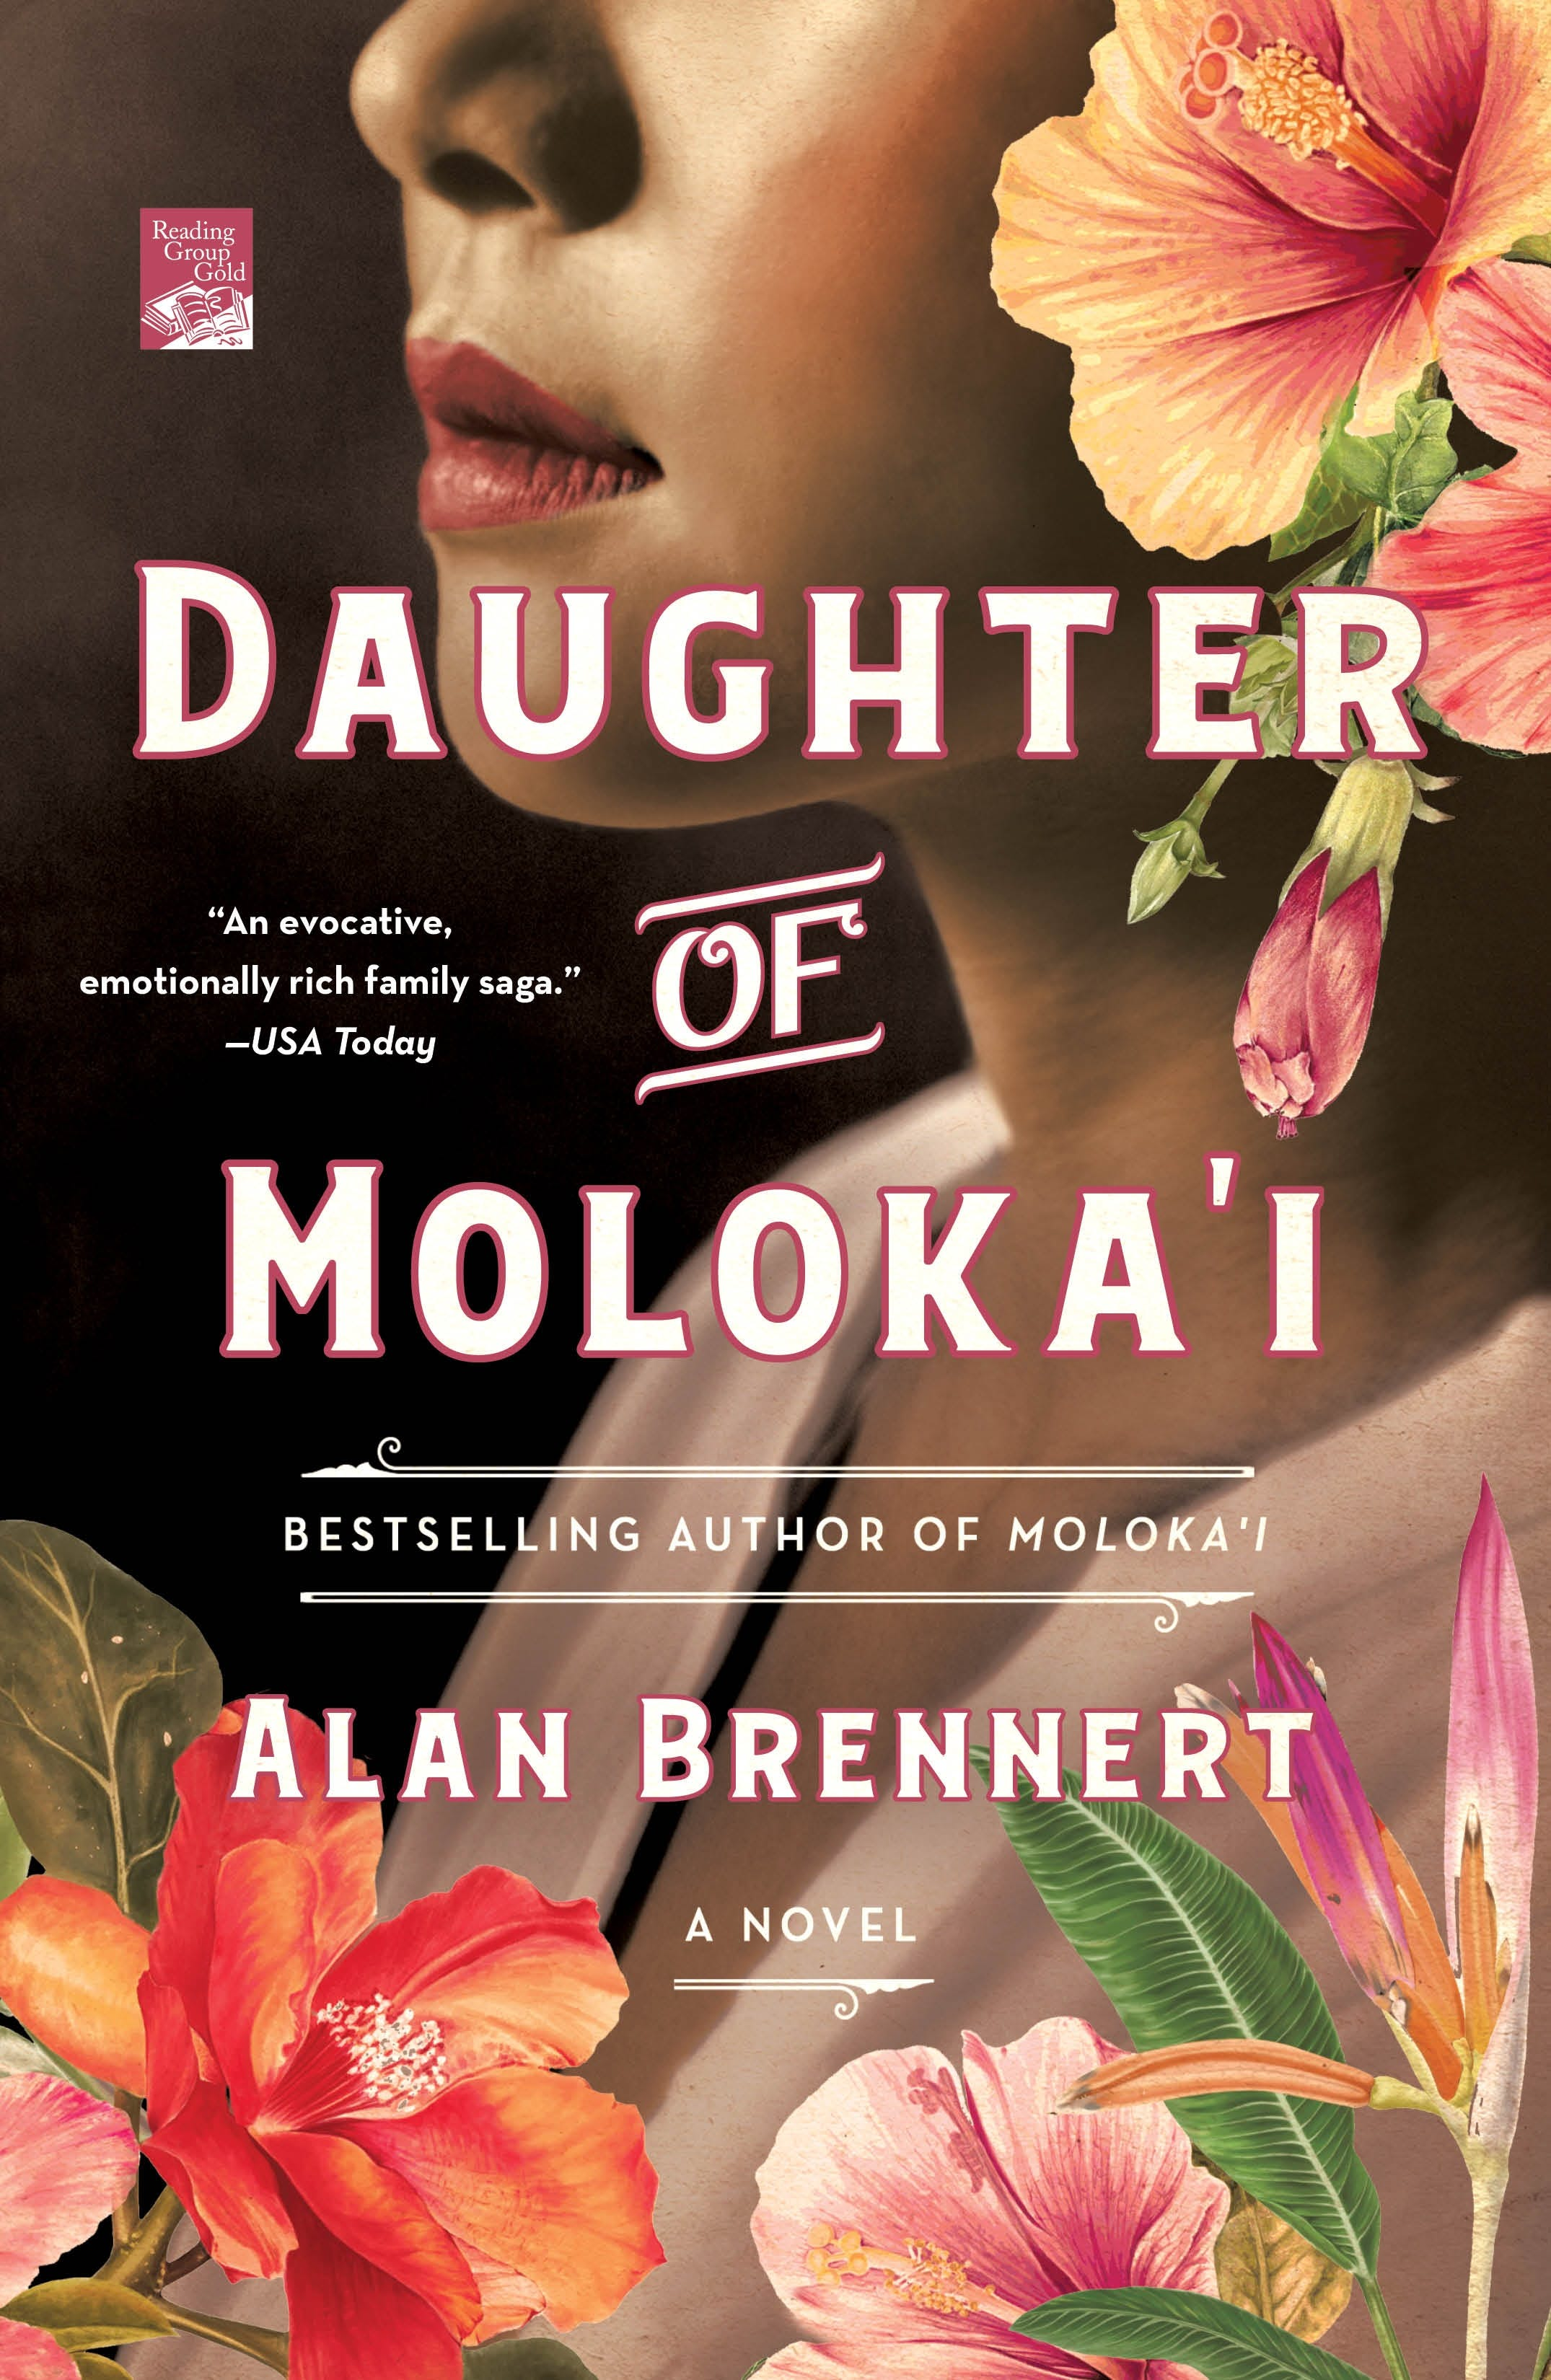 Image of Daughter of Moloka'i